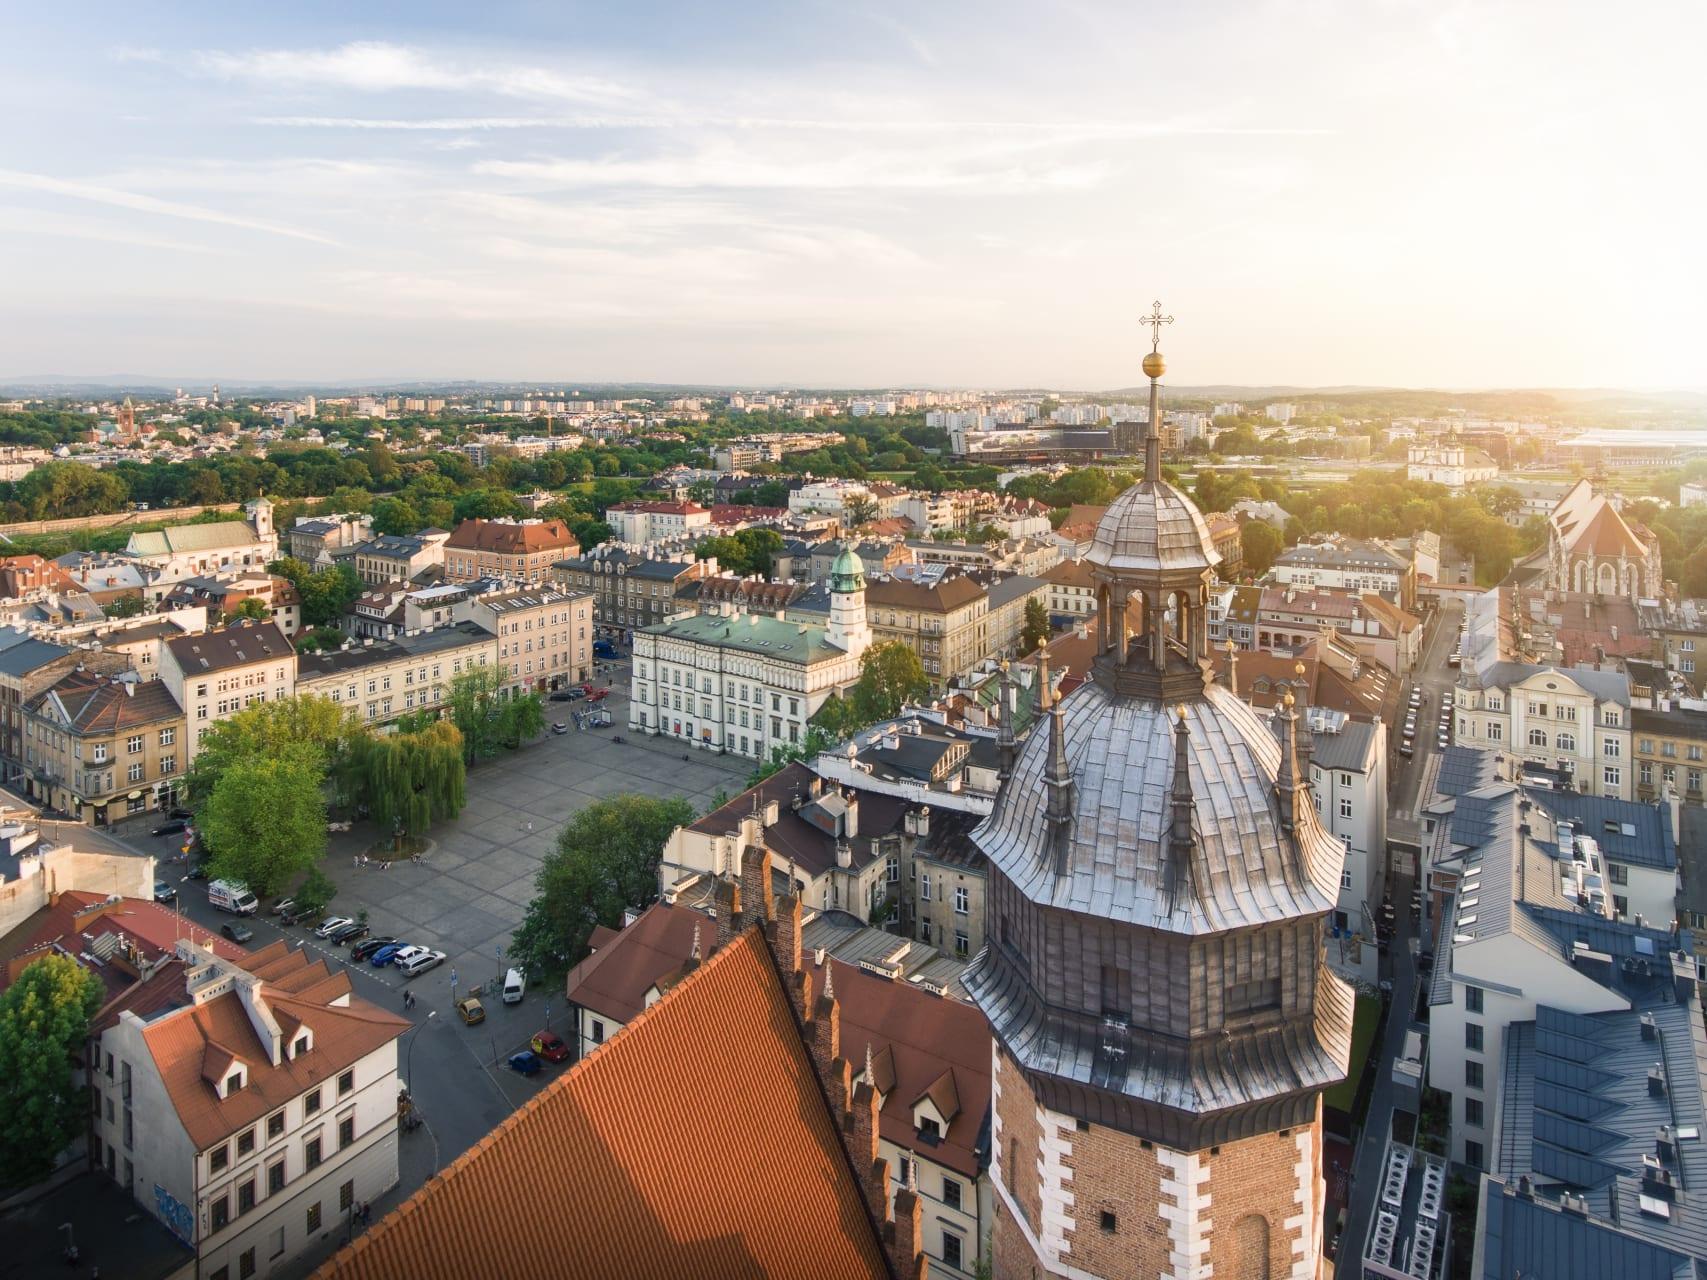 Krakow - Kazimierz - The European Jerusalem